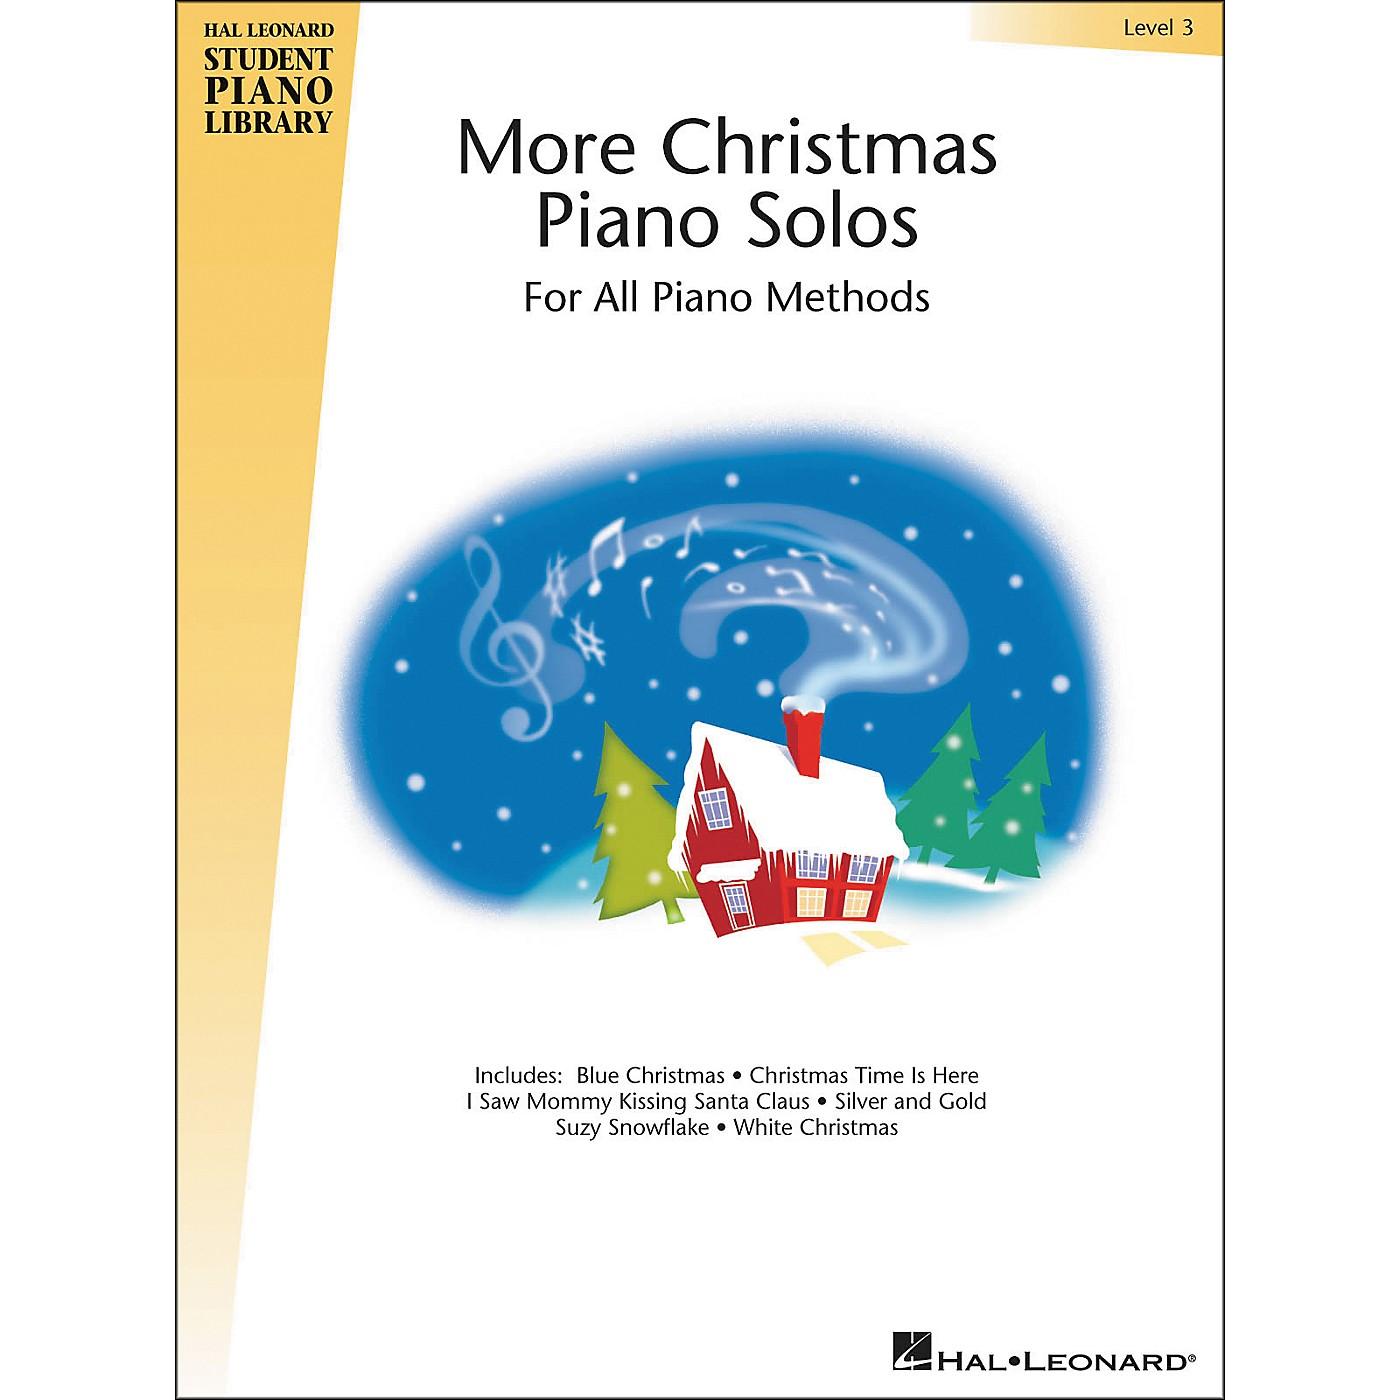 Hal Leonard More Christmas Piano Solos Book 3 Hal Leonard Student Piano Library thumbnail